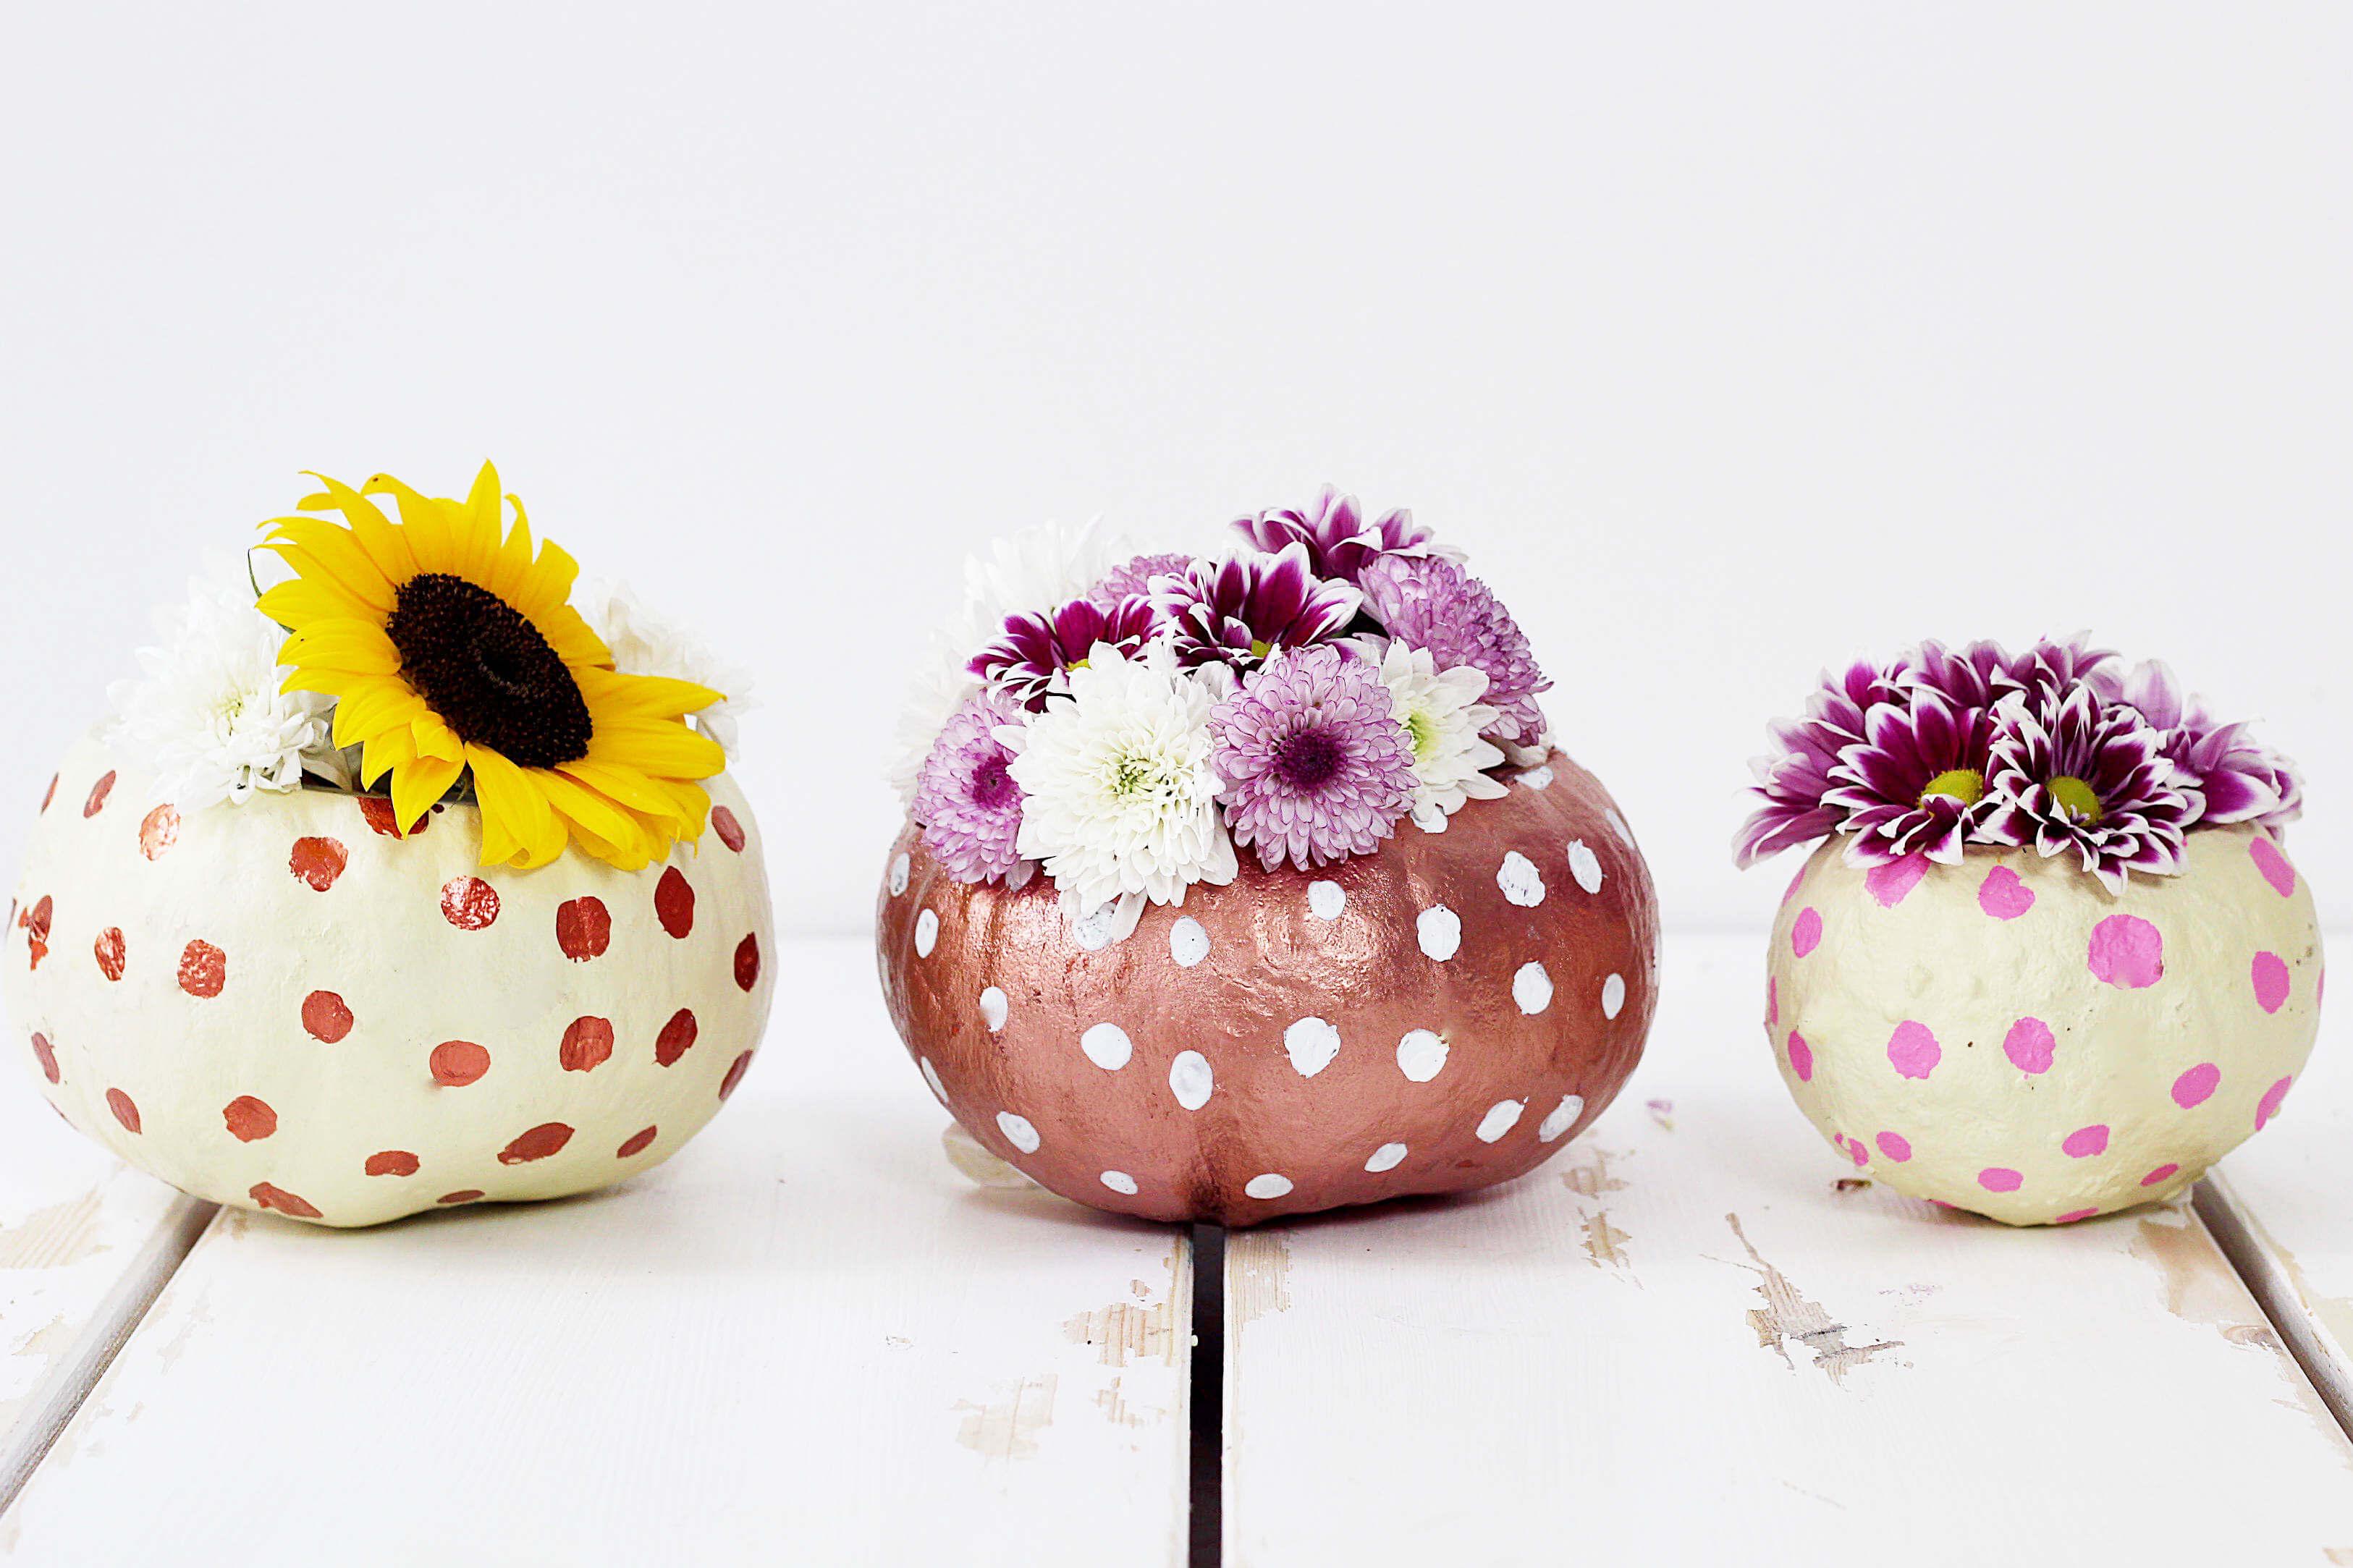 Kürbisdeko Basteln: DIY Vasen Aus Kürbis Selber Machen